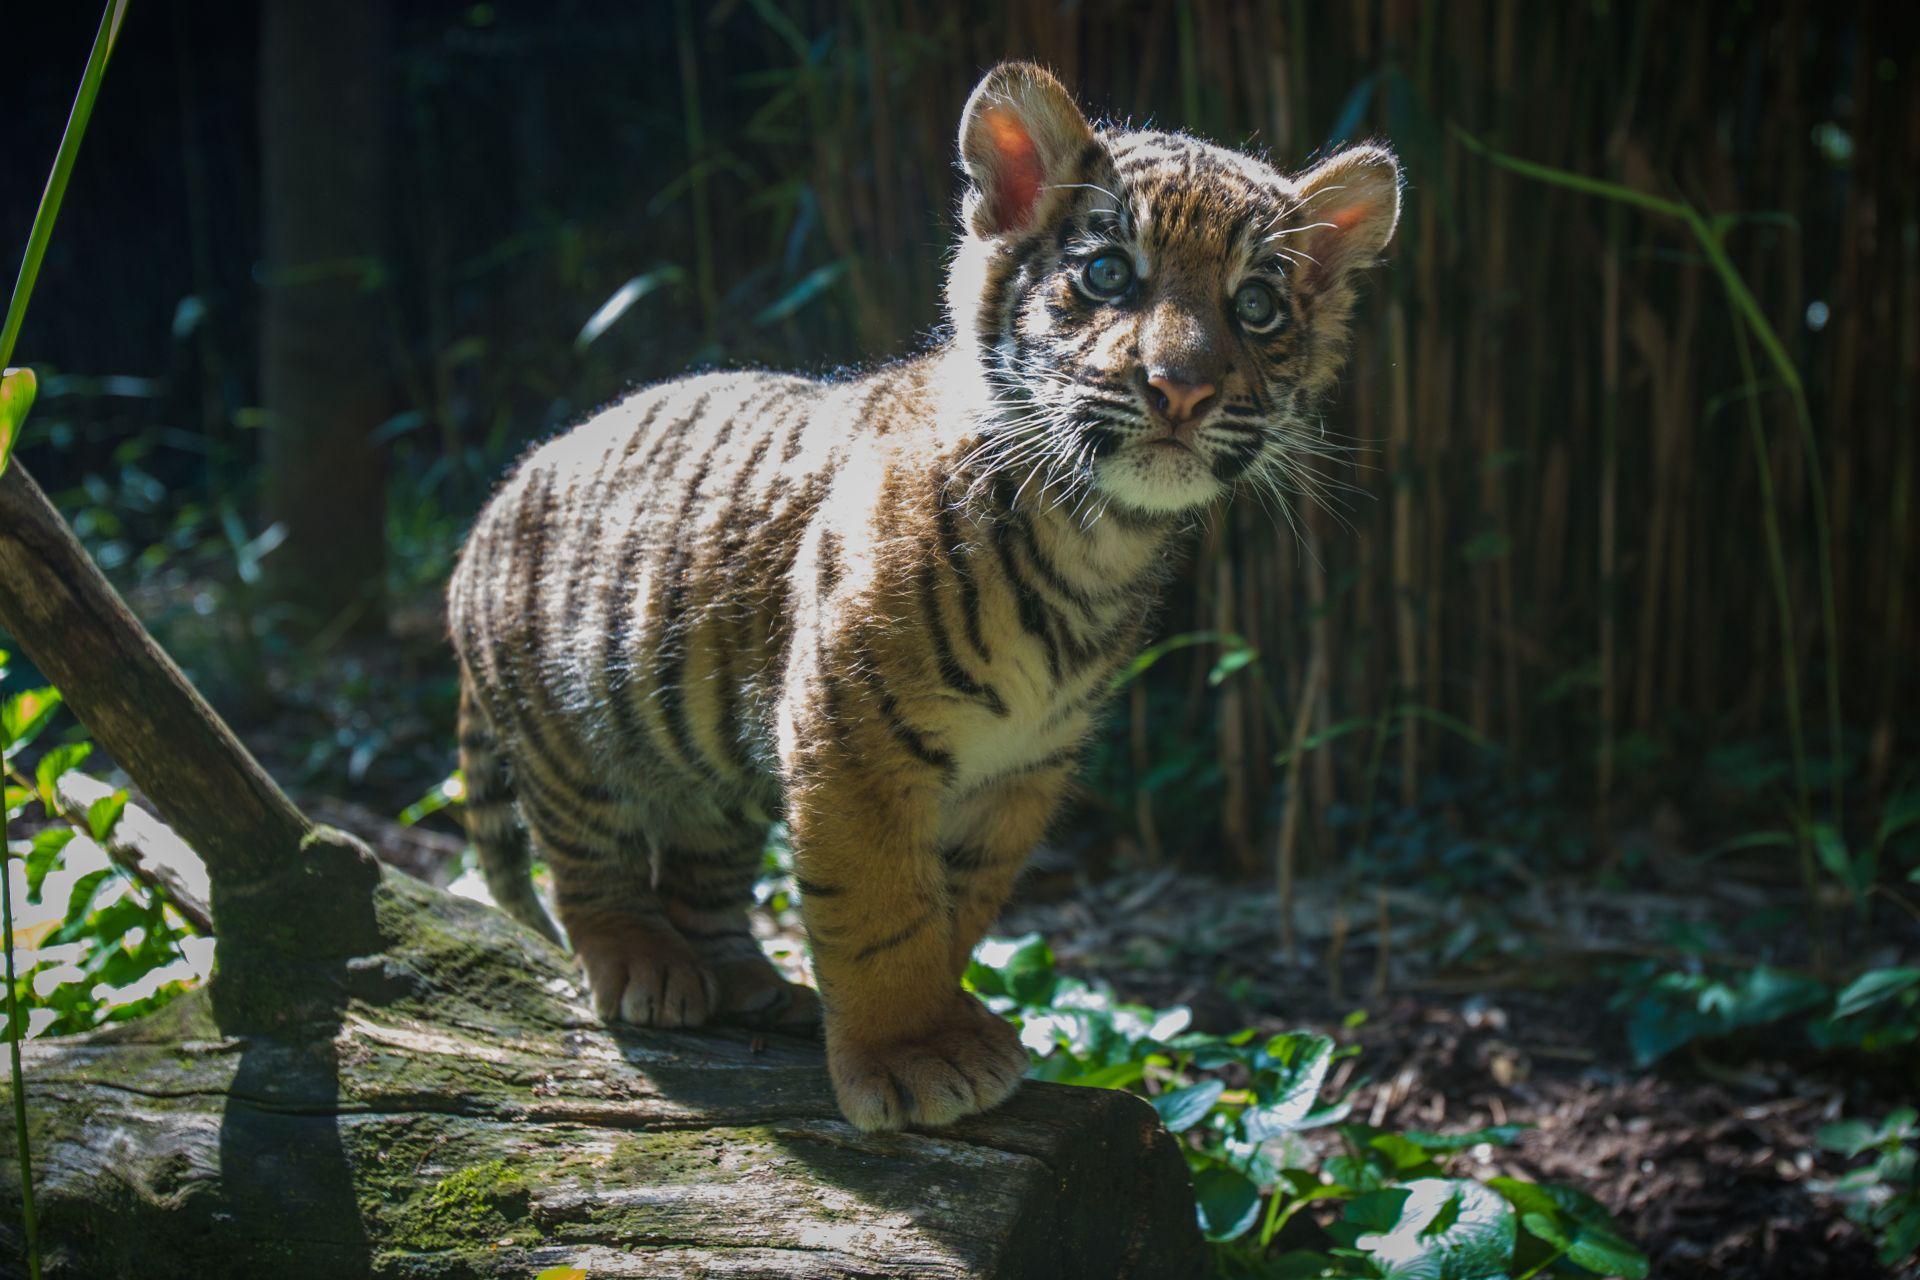 Tiger Baby, 1080p Wallpaper